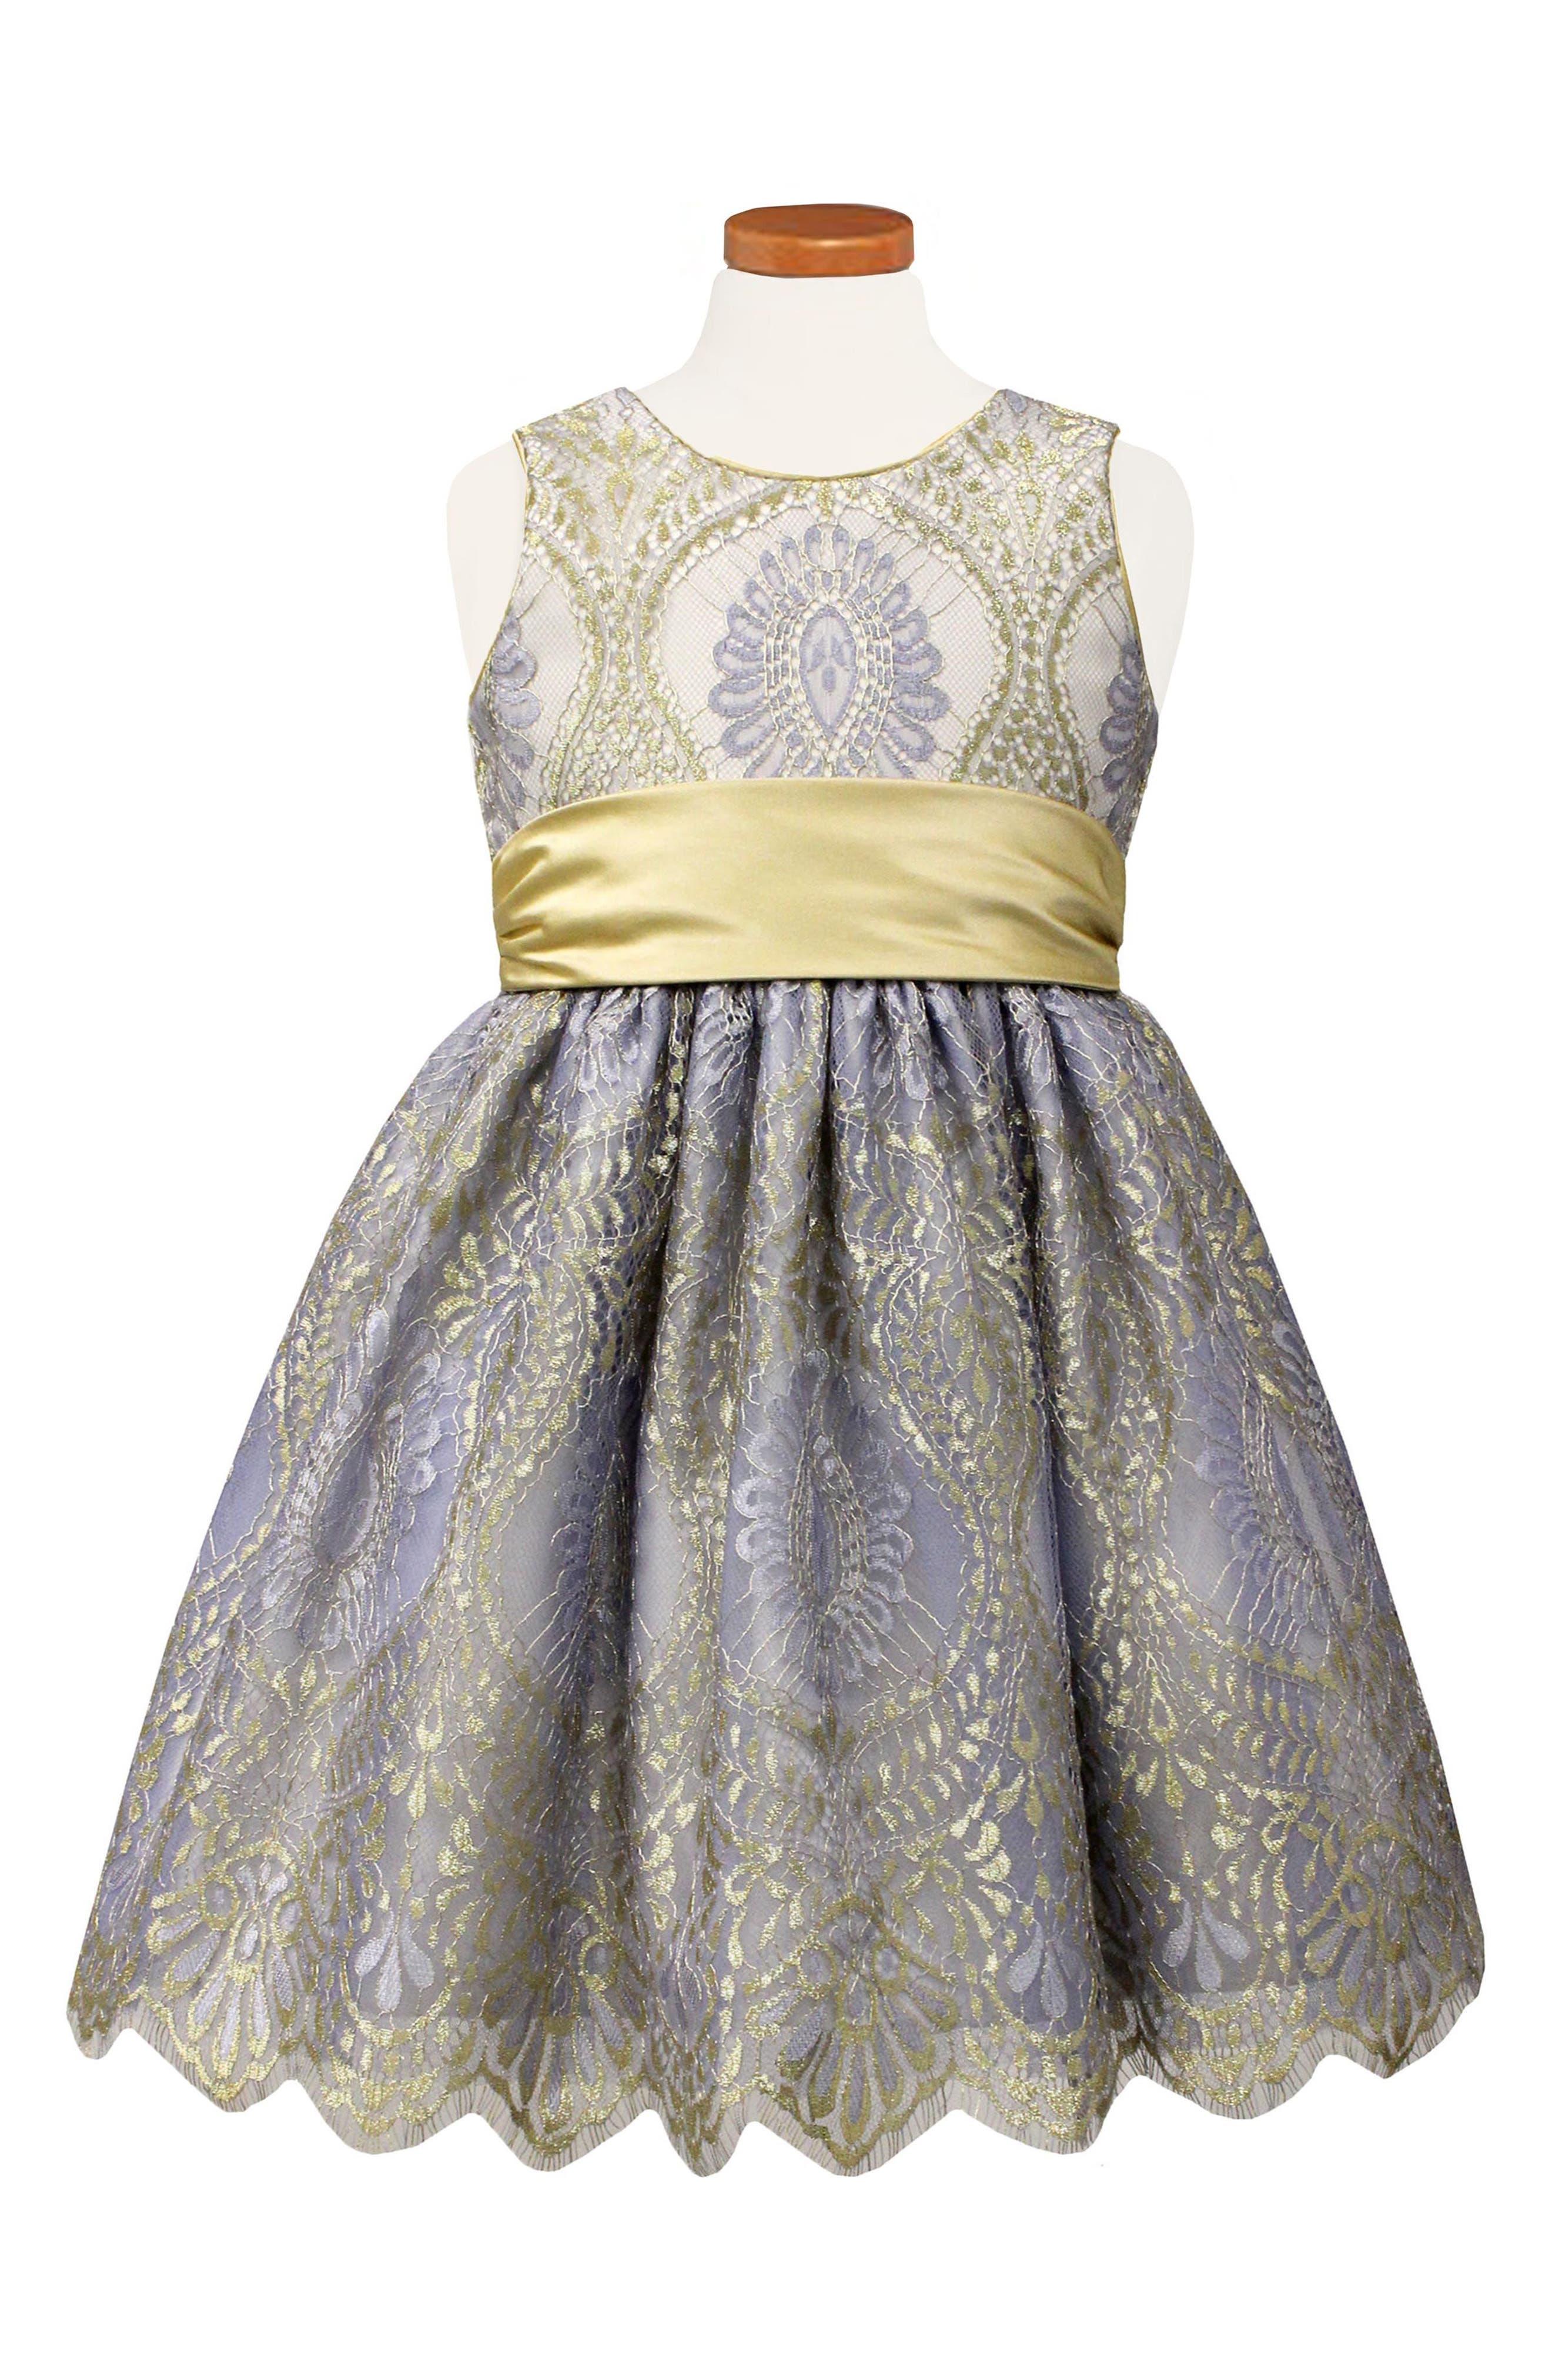 Alternate Image 1 Selected - Sorbet Lace Party Dress (Toddler Girls & Little Girls)